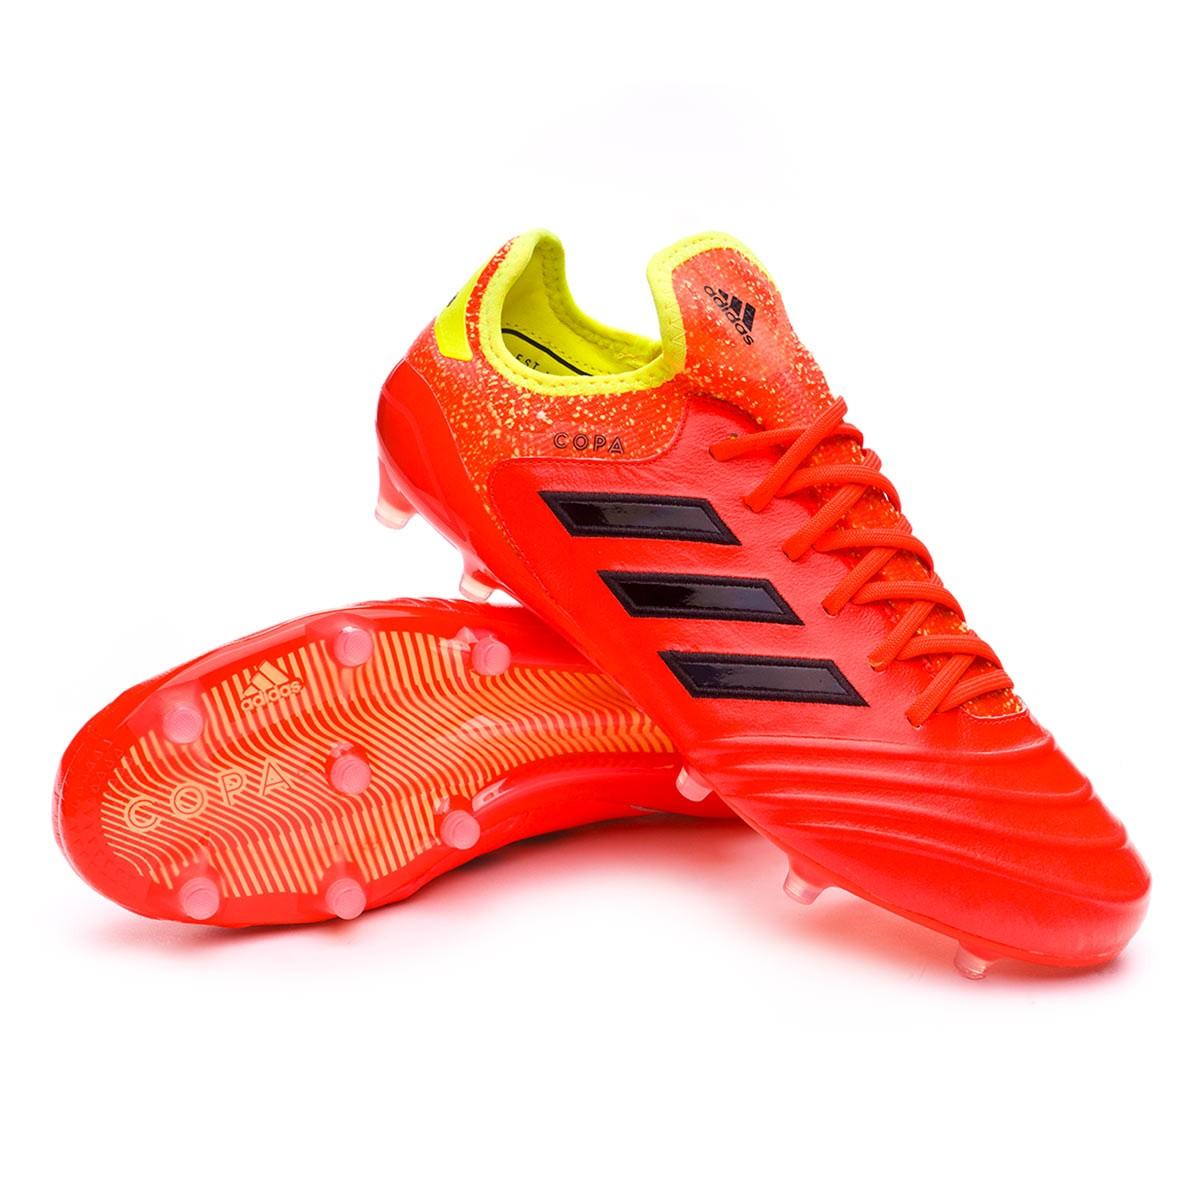 931c416e6 Football Boots adidas Copa 18.1 FG Solar red-Black-Solar yellow ...